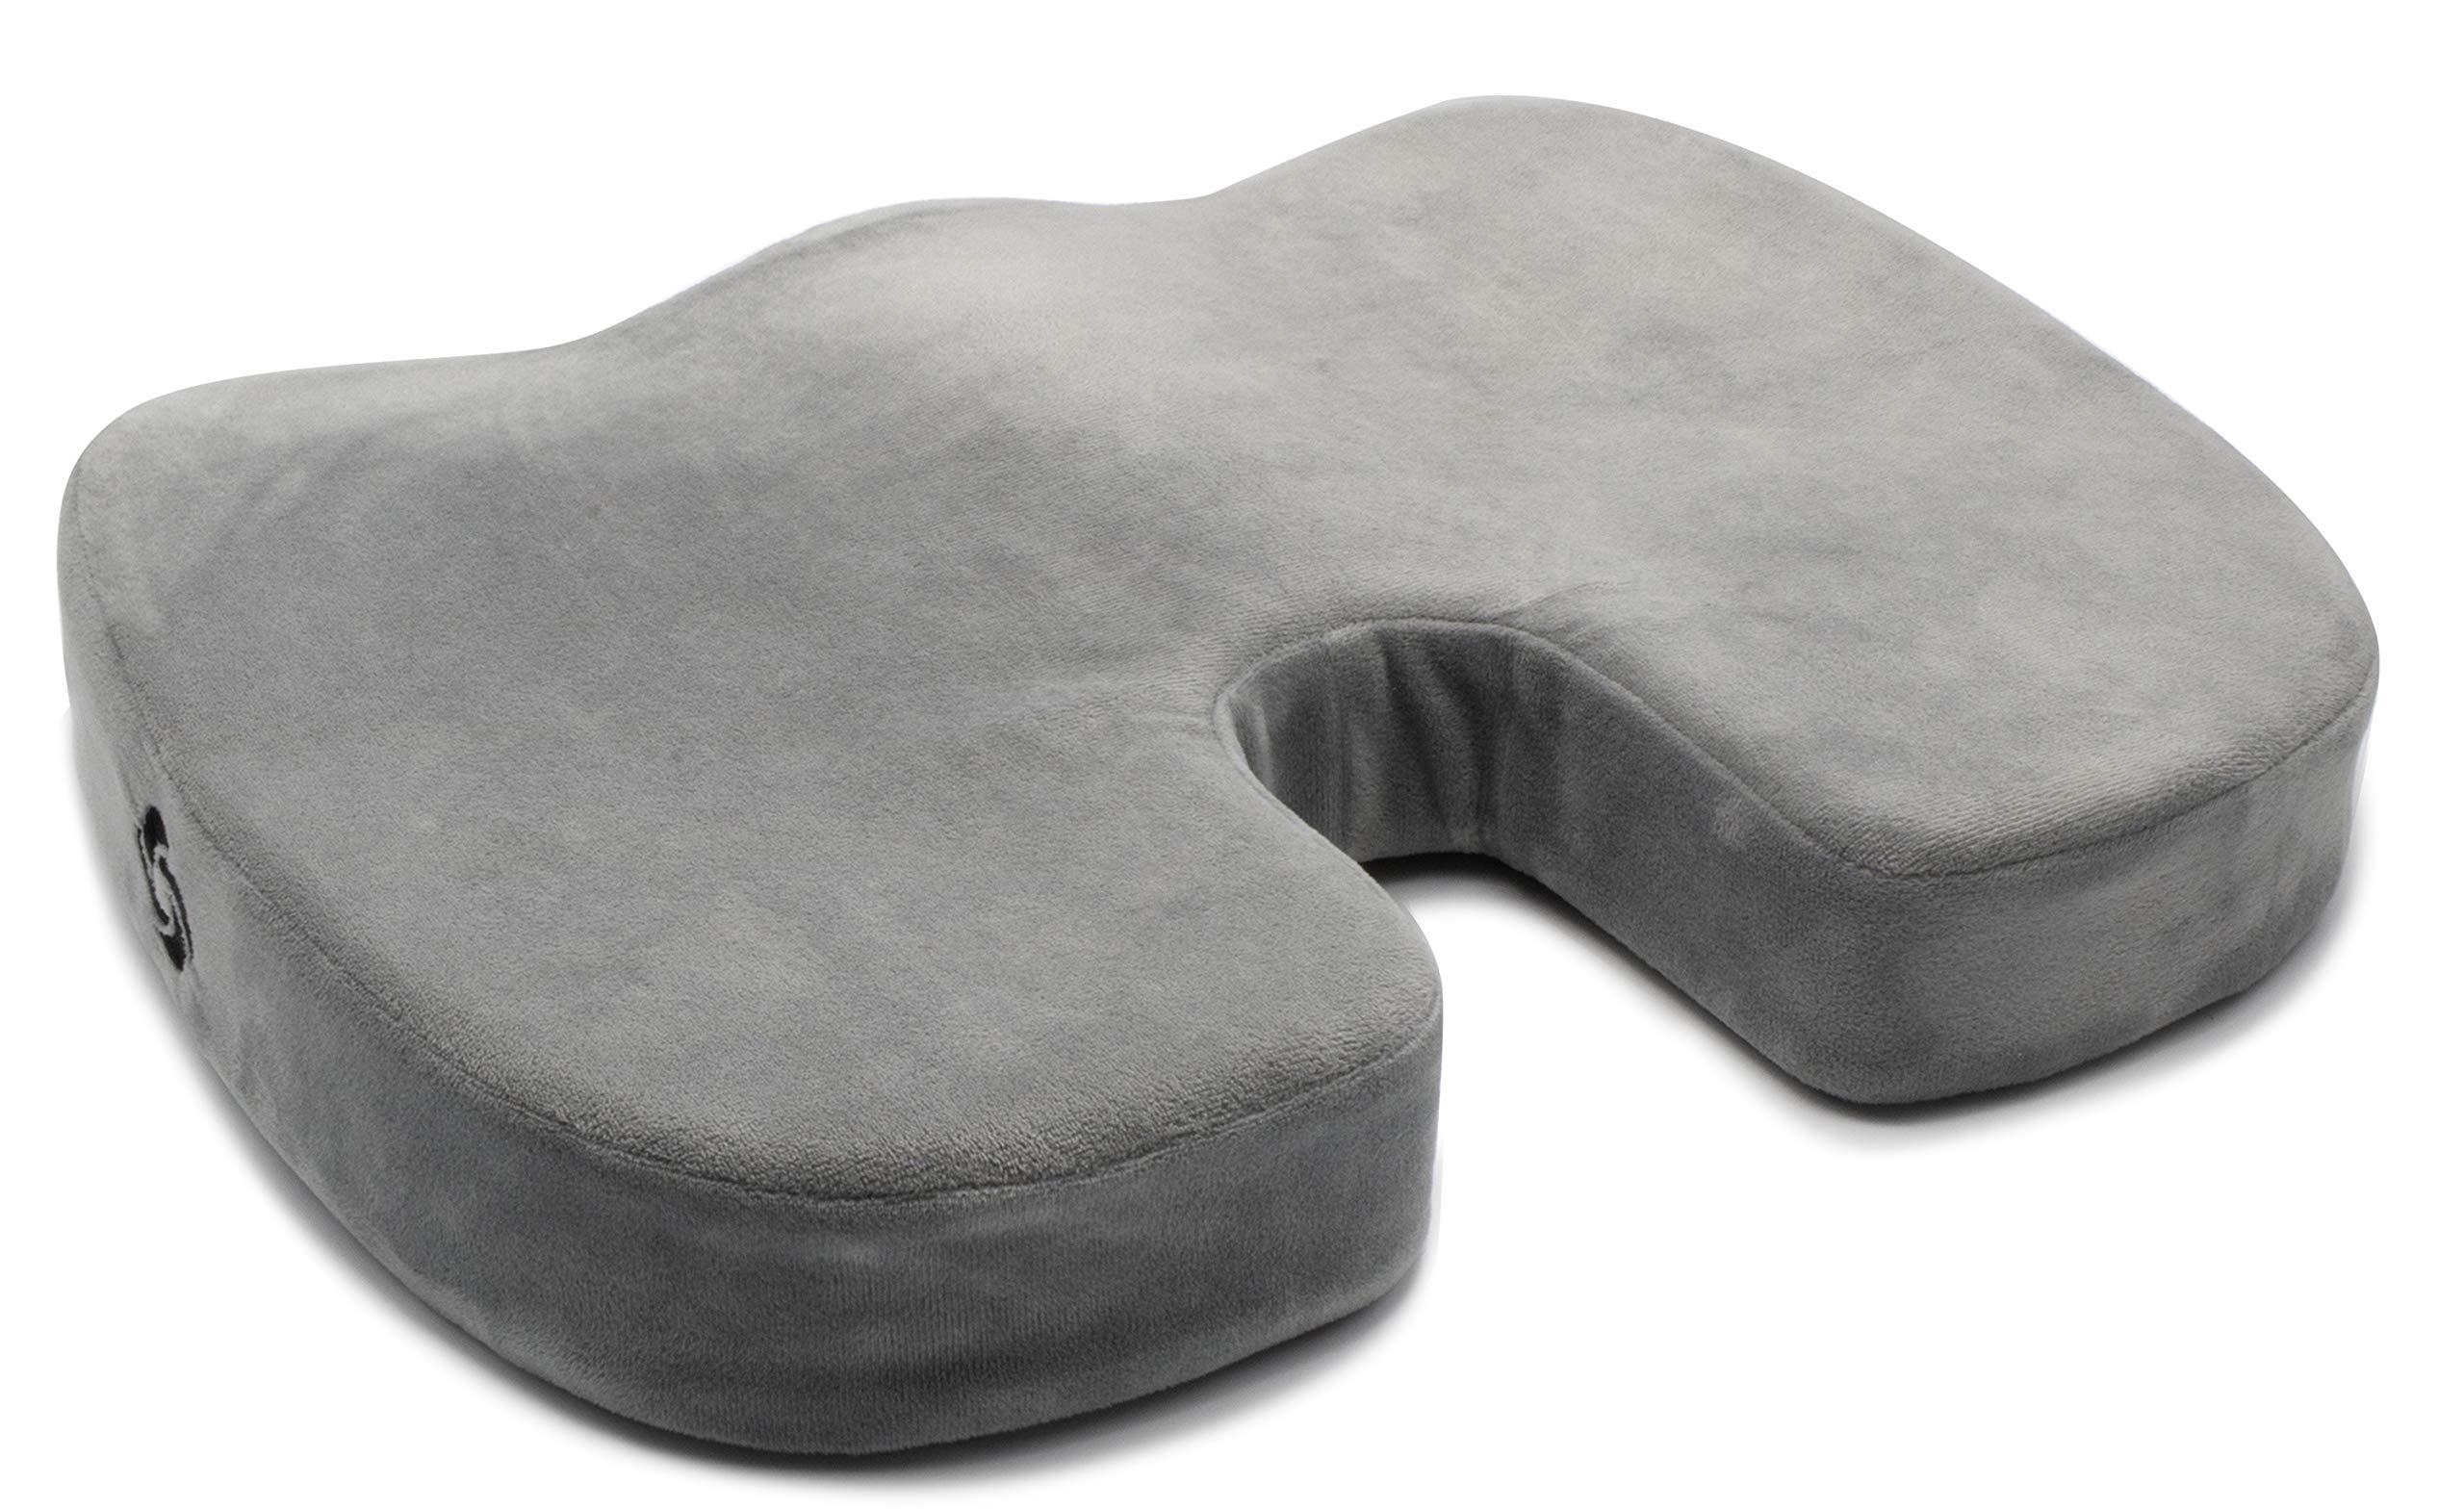 Samsonite SA5451 Orthopedic Gray Seat Cushion